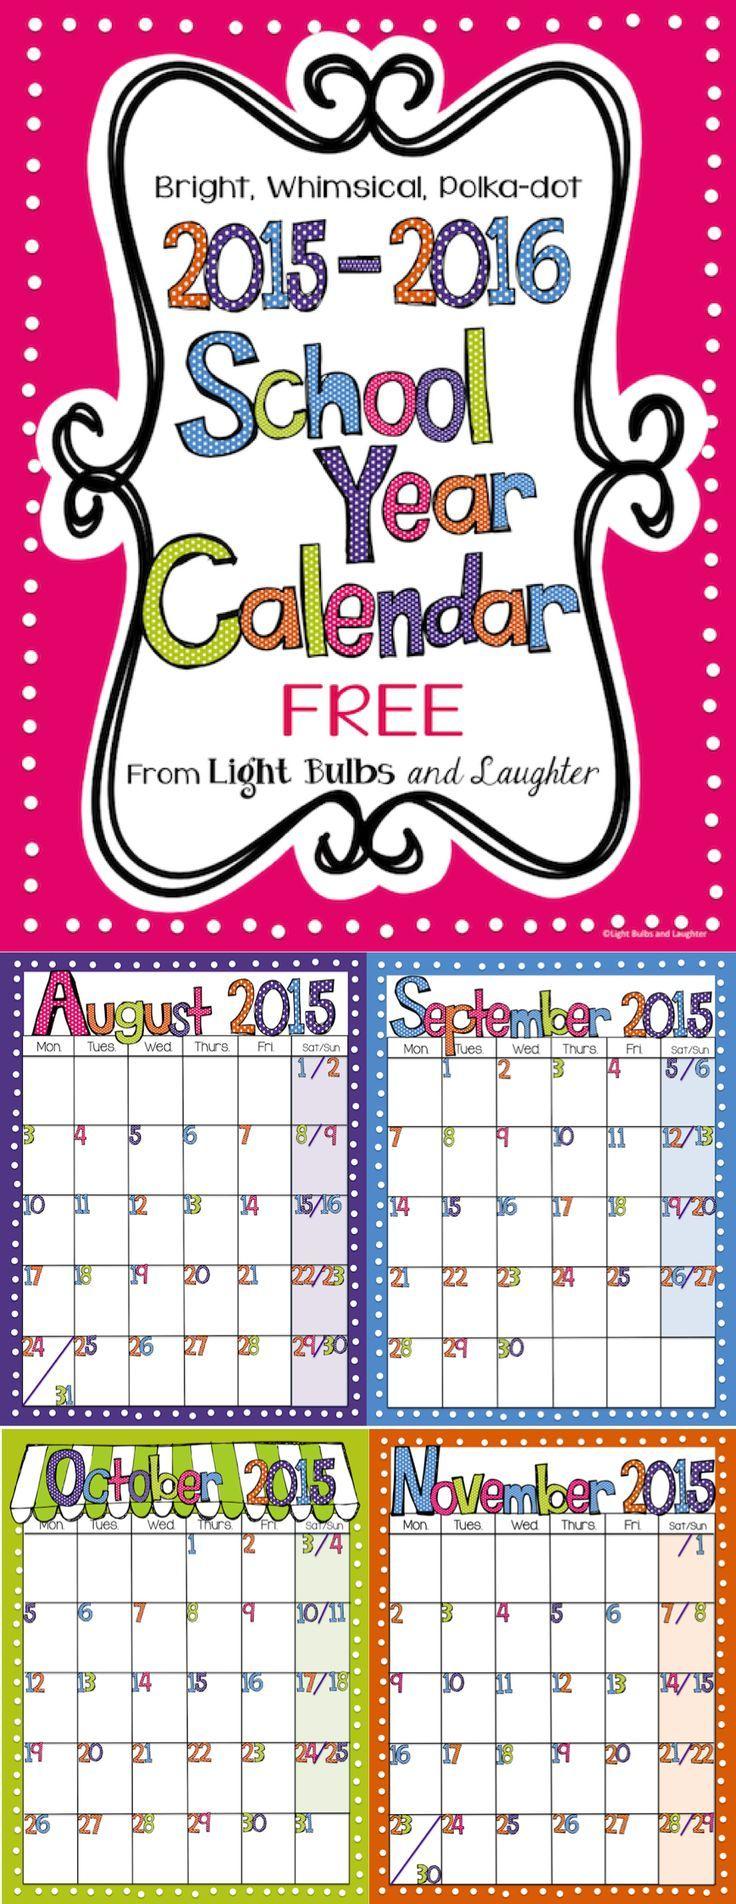 Art Teacher Calendar : Free bright whimsical school year calendar print